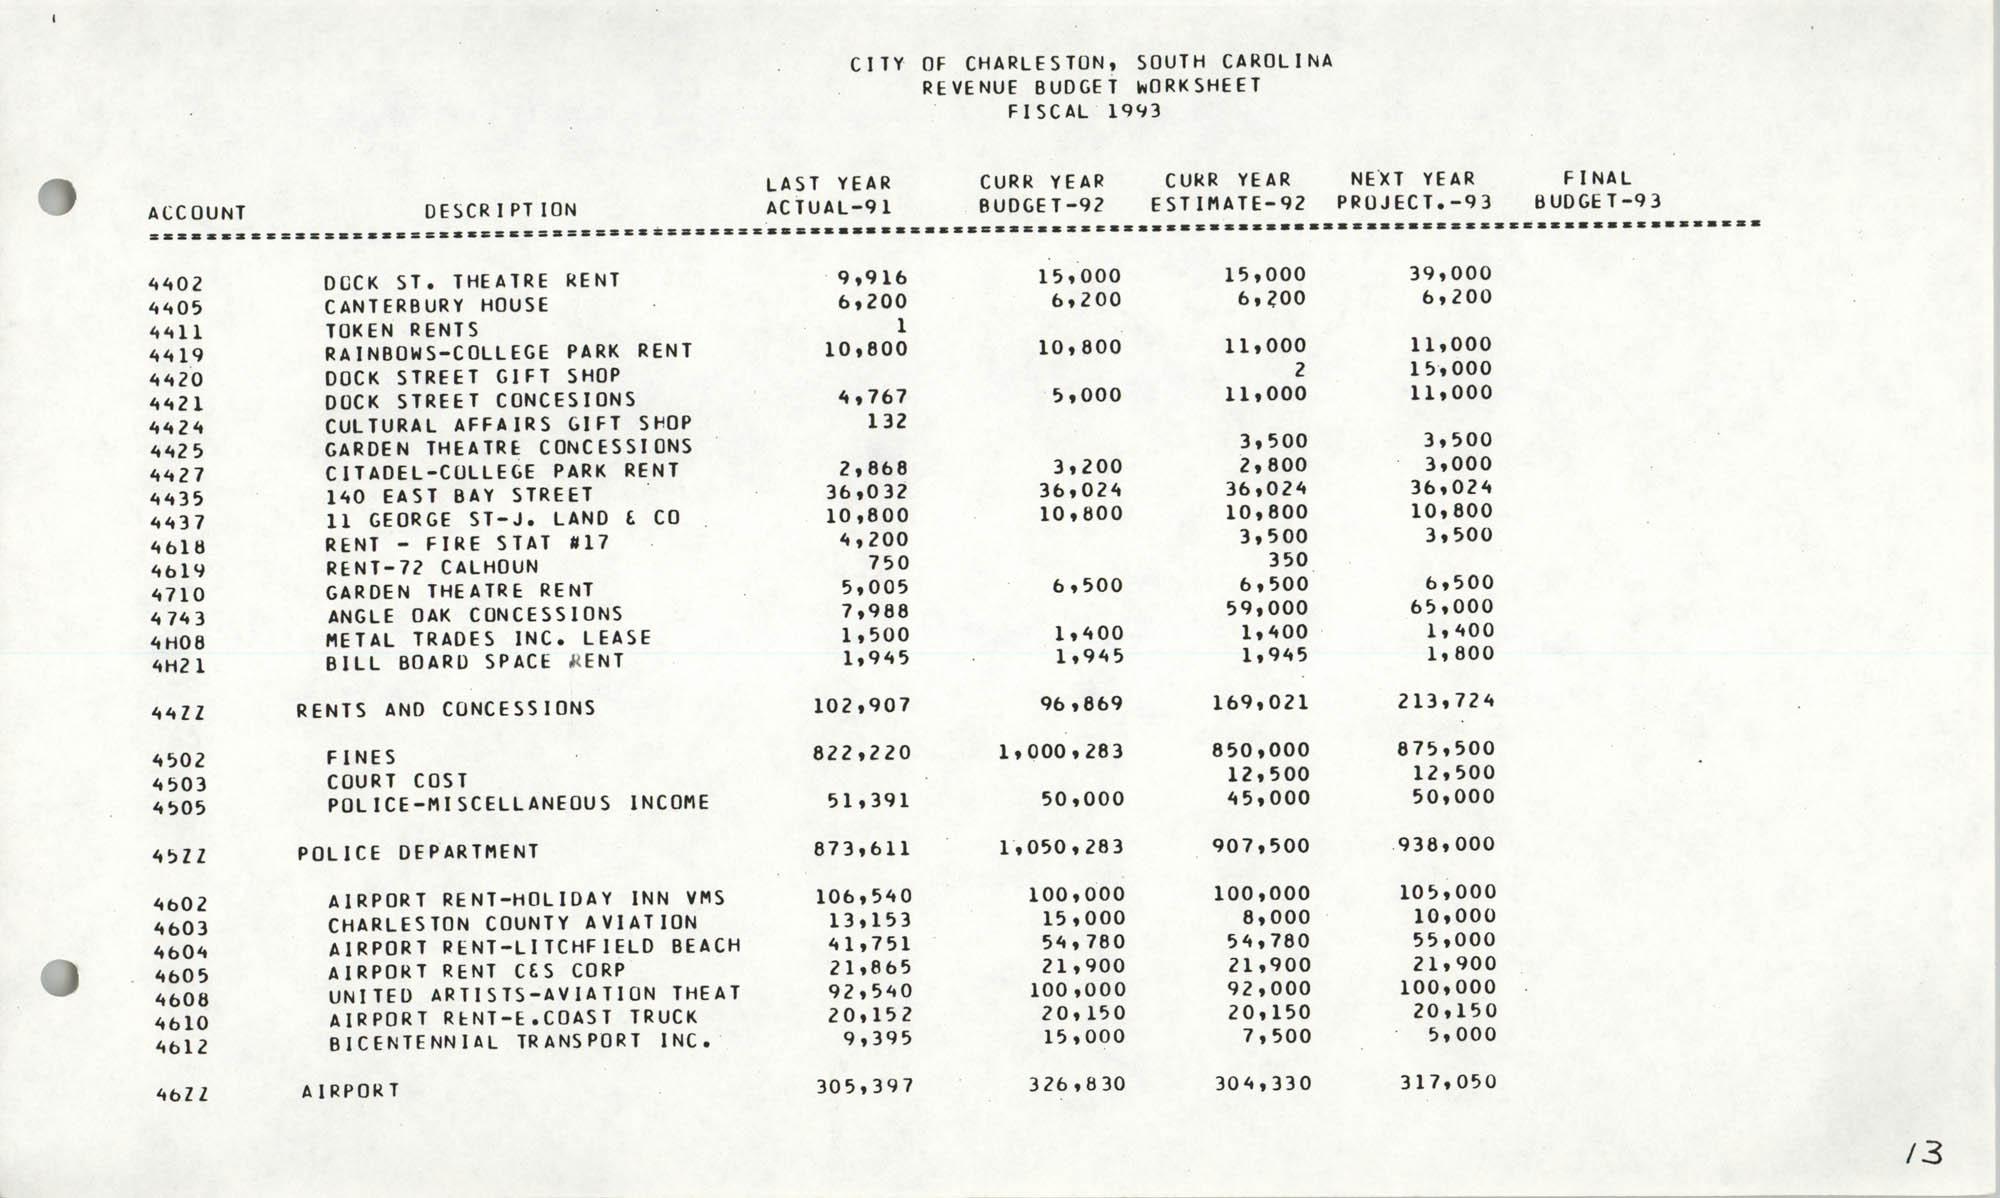 The City Council of Charleston, South Carolina, 1993 Budget, Page 13